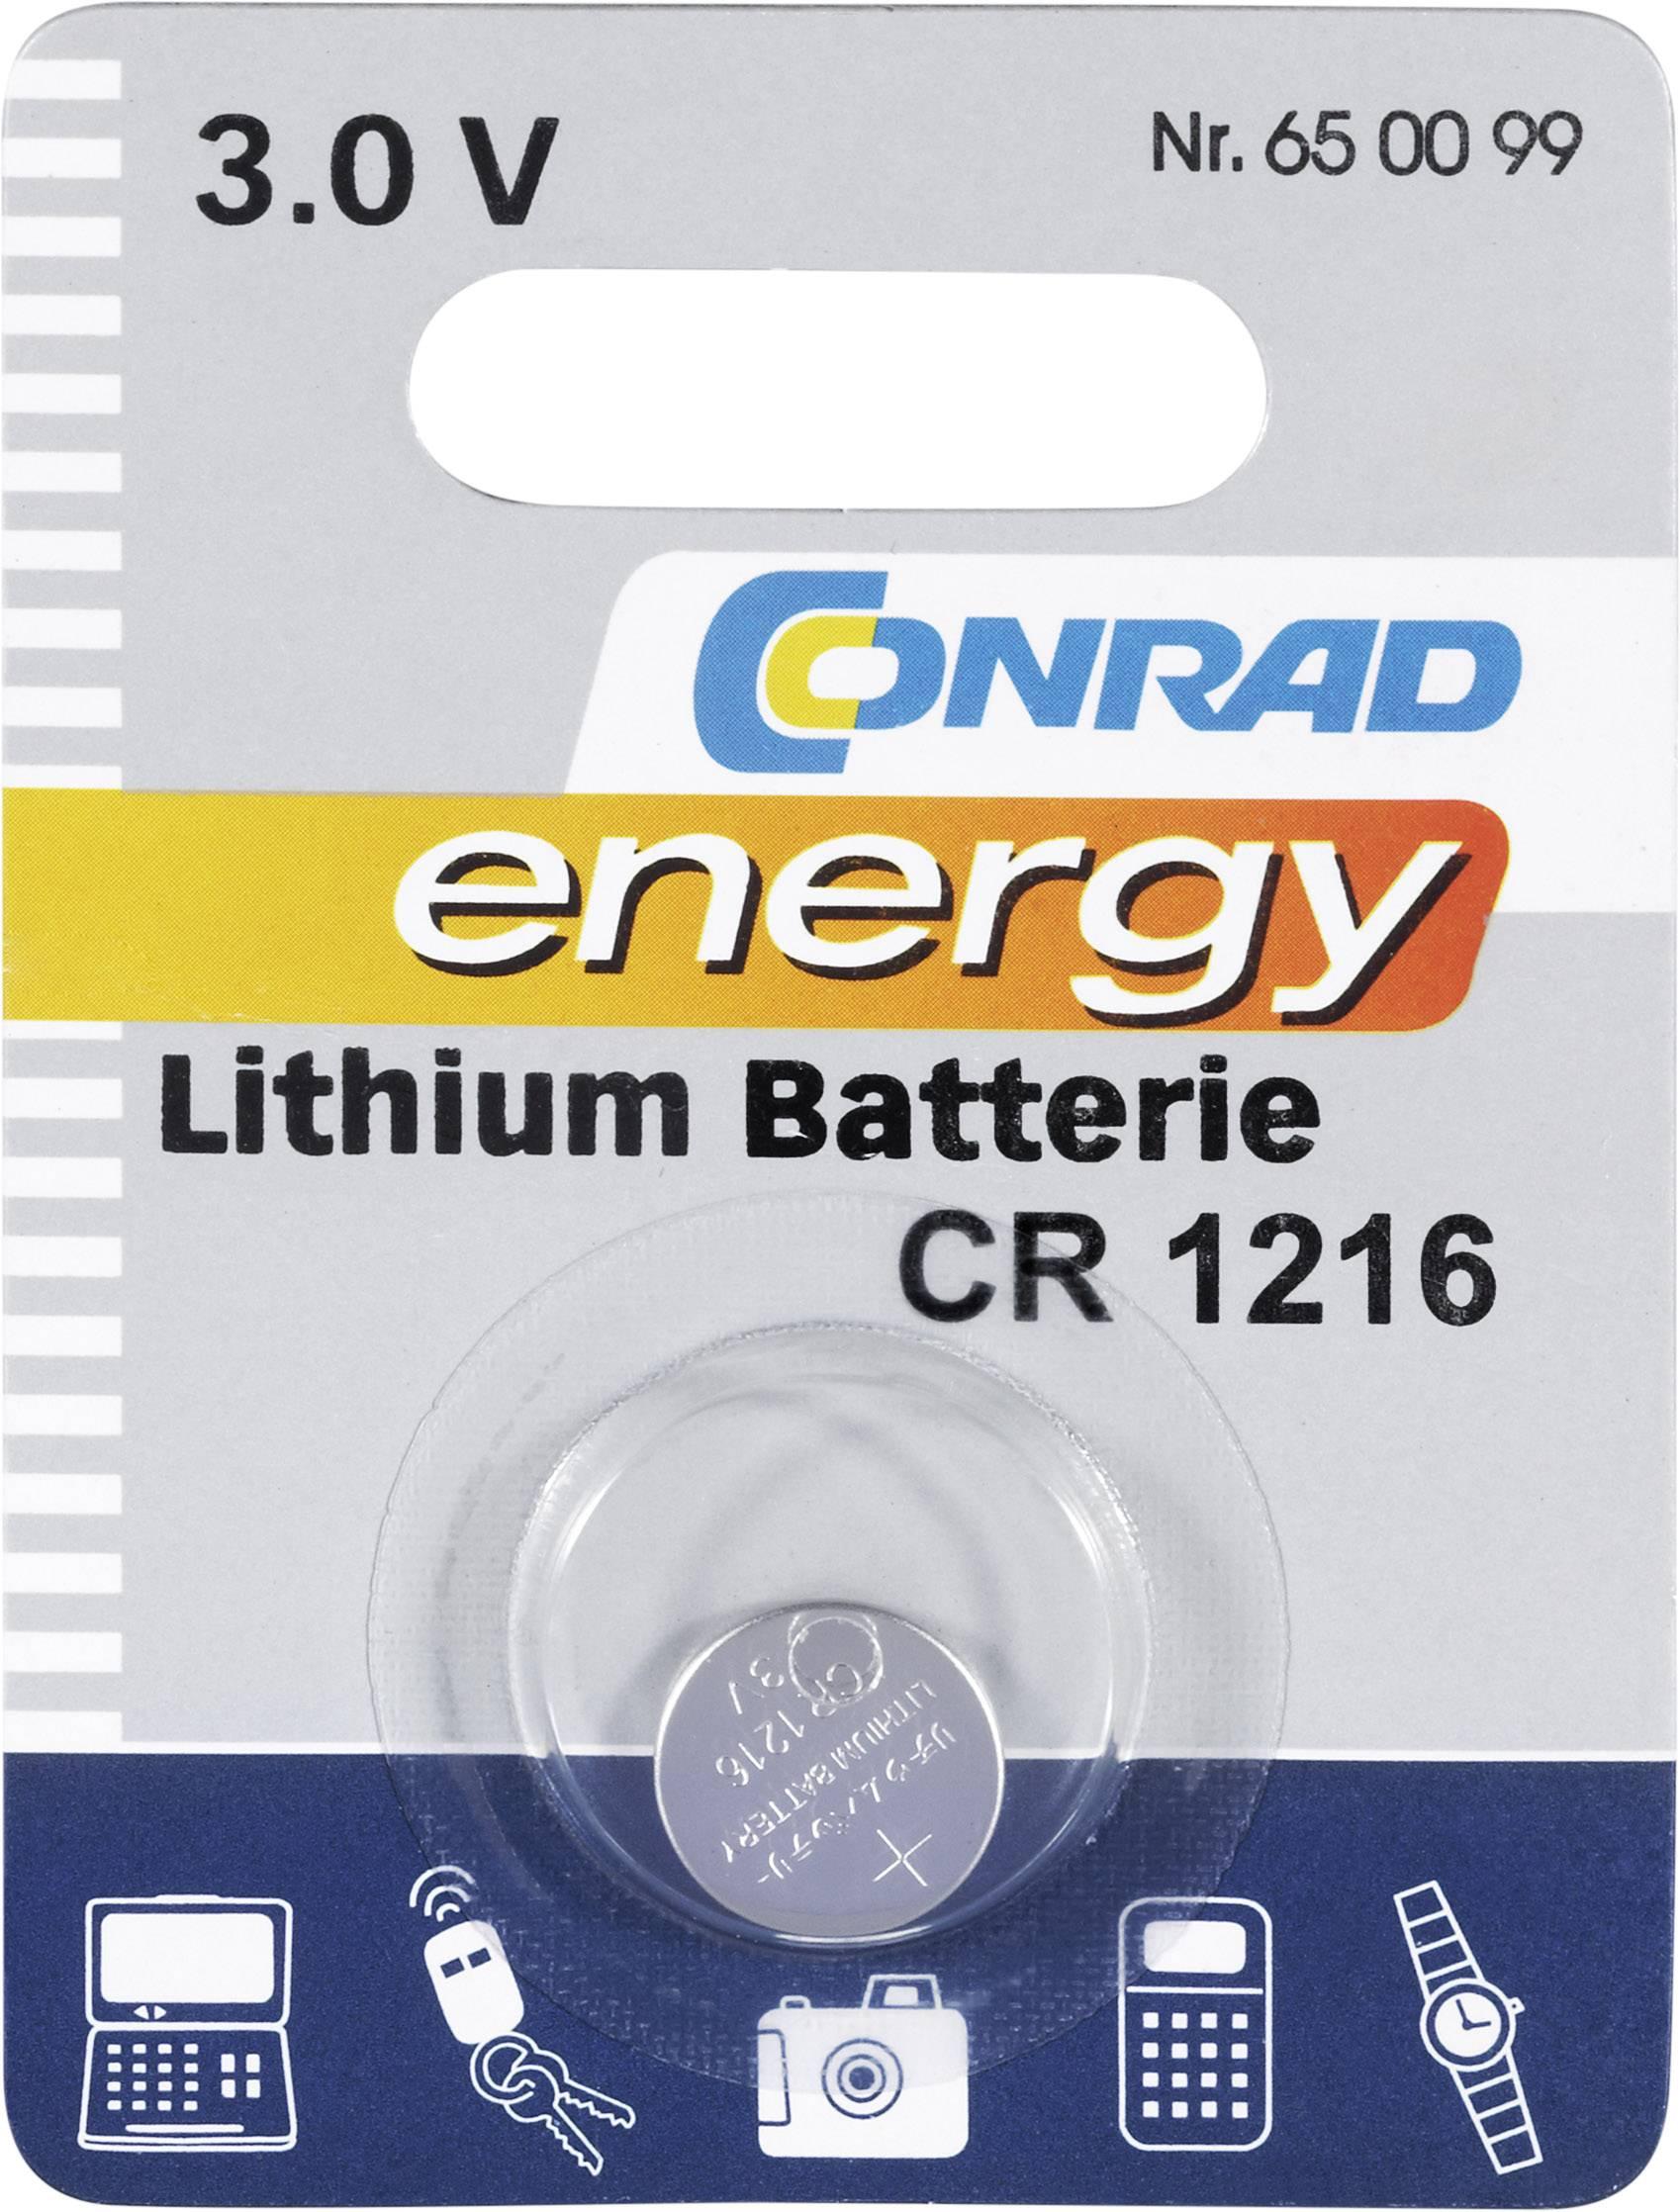 Knoflíková baterie Conrad energy CR1216, lithium